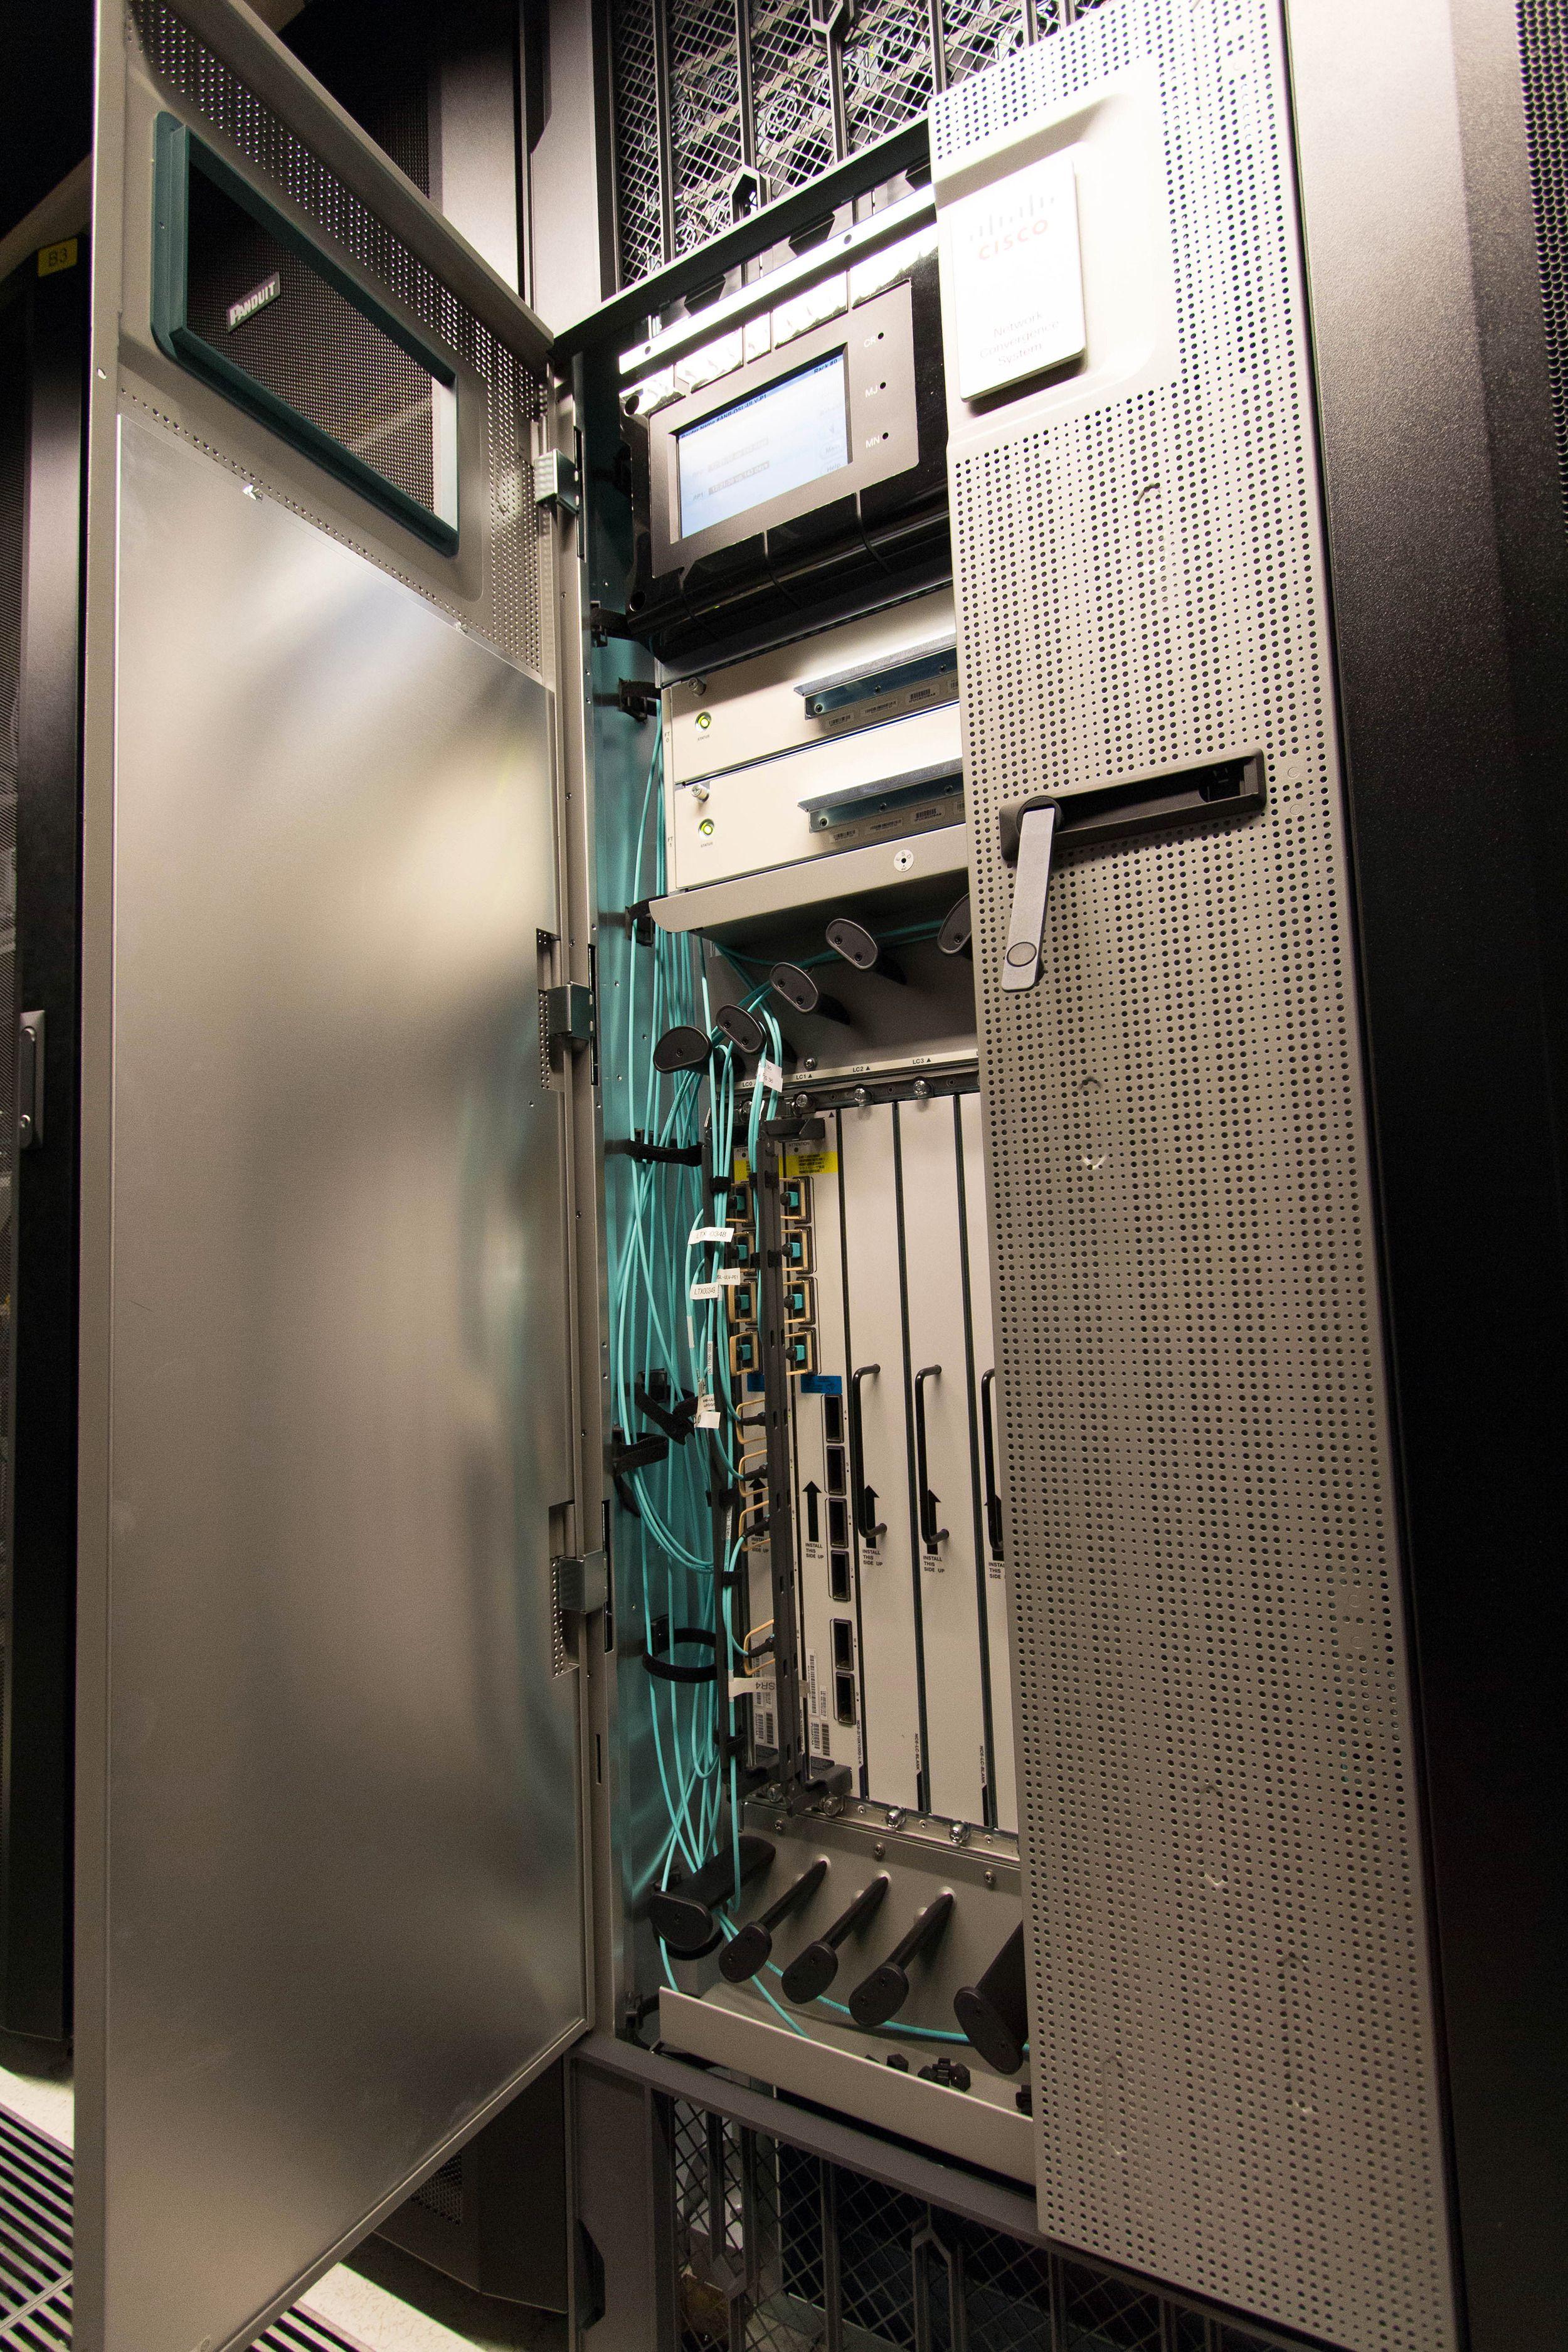 Cisco NCS 6000-ruteren. Foto: Vegar Jansen, Tek.no